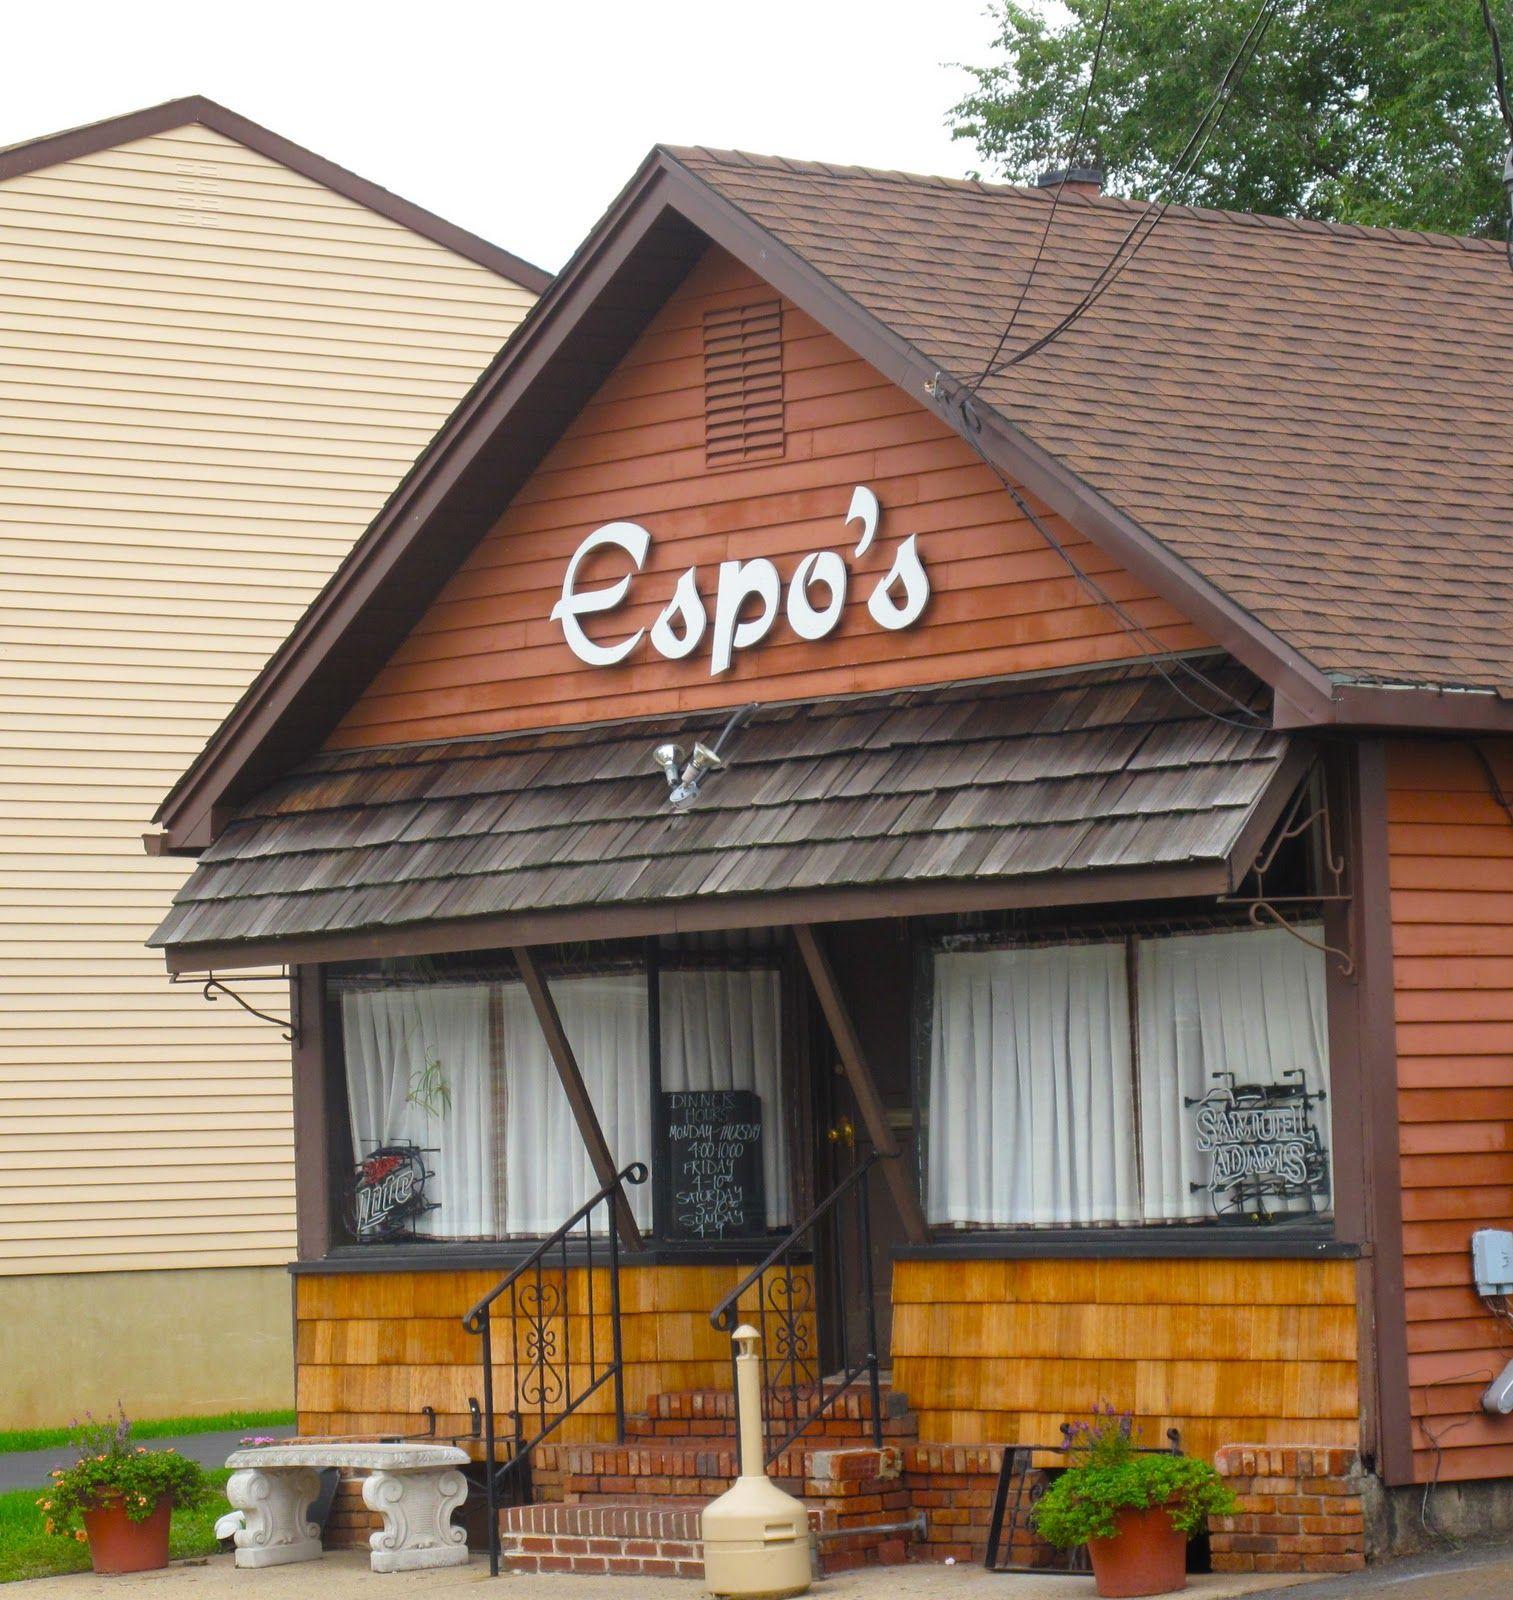 Restaurants Italian Near Me: Best Italian Food - Espo's, Raritan NJ